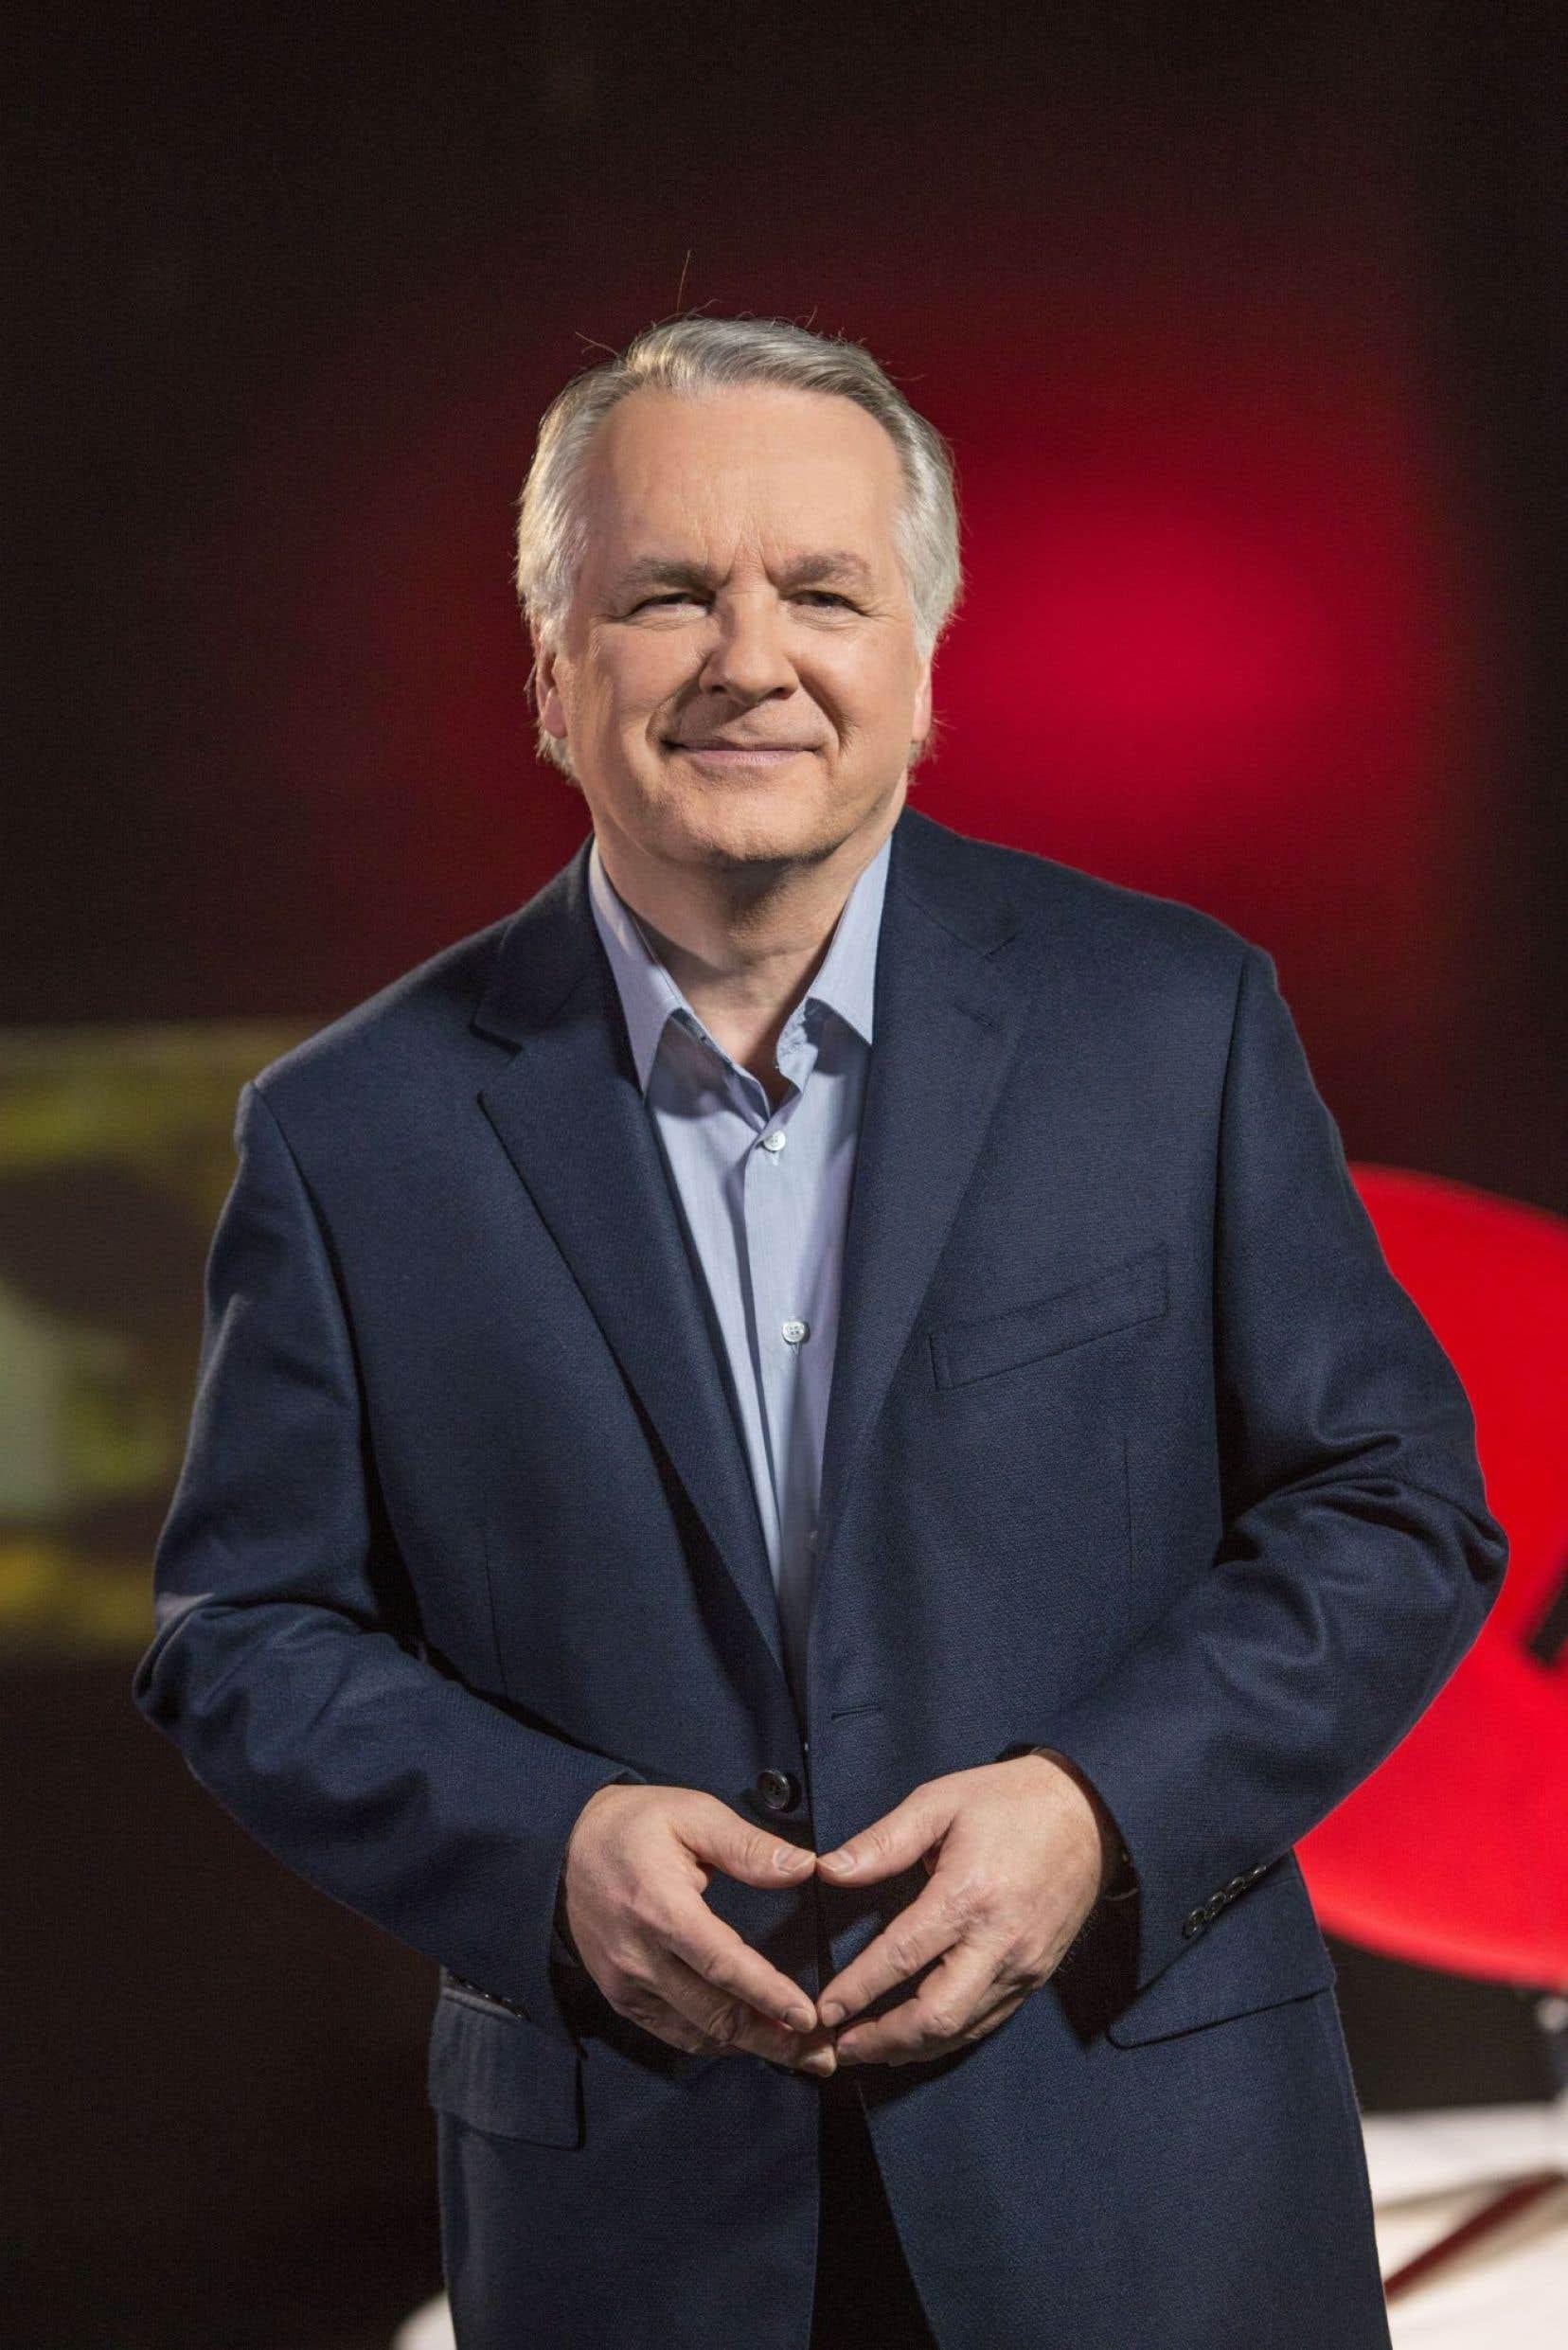 Guy Gendron est l'ombudsman de Radio-Canada depuis le 1eravril 2016.